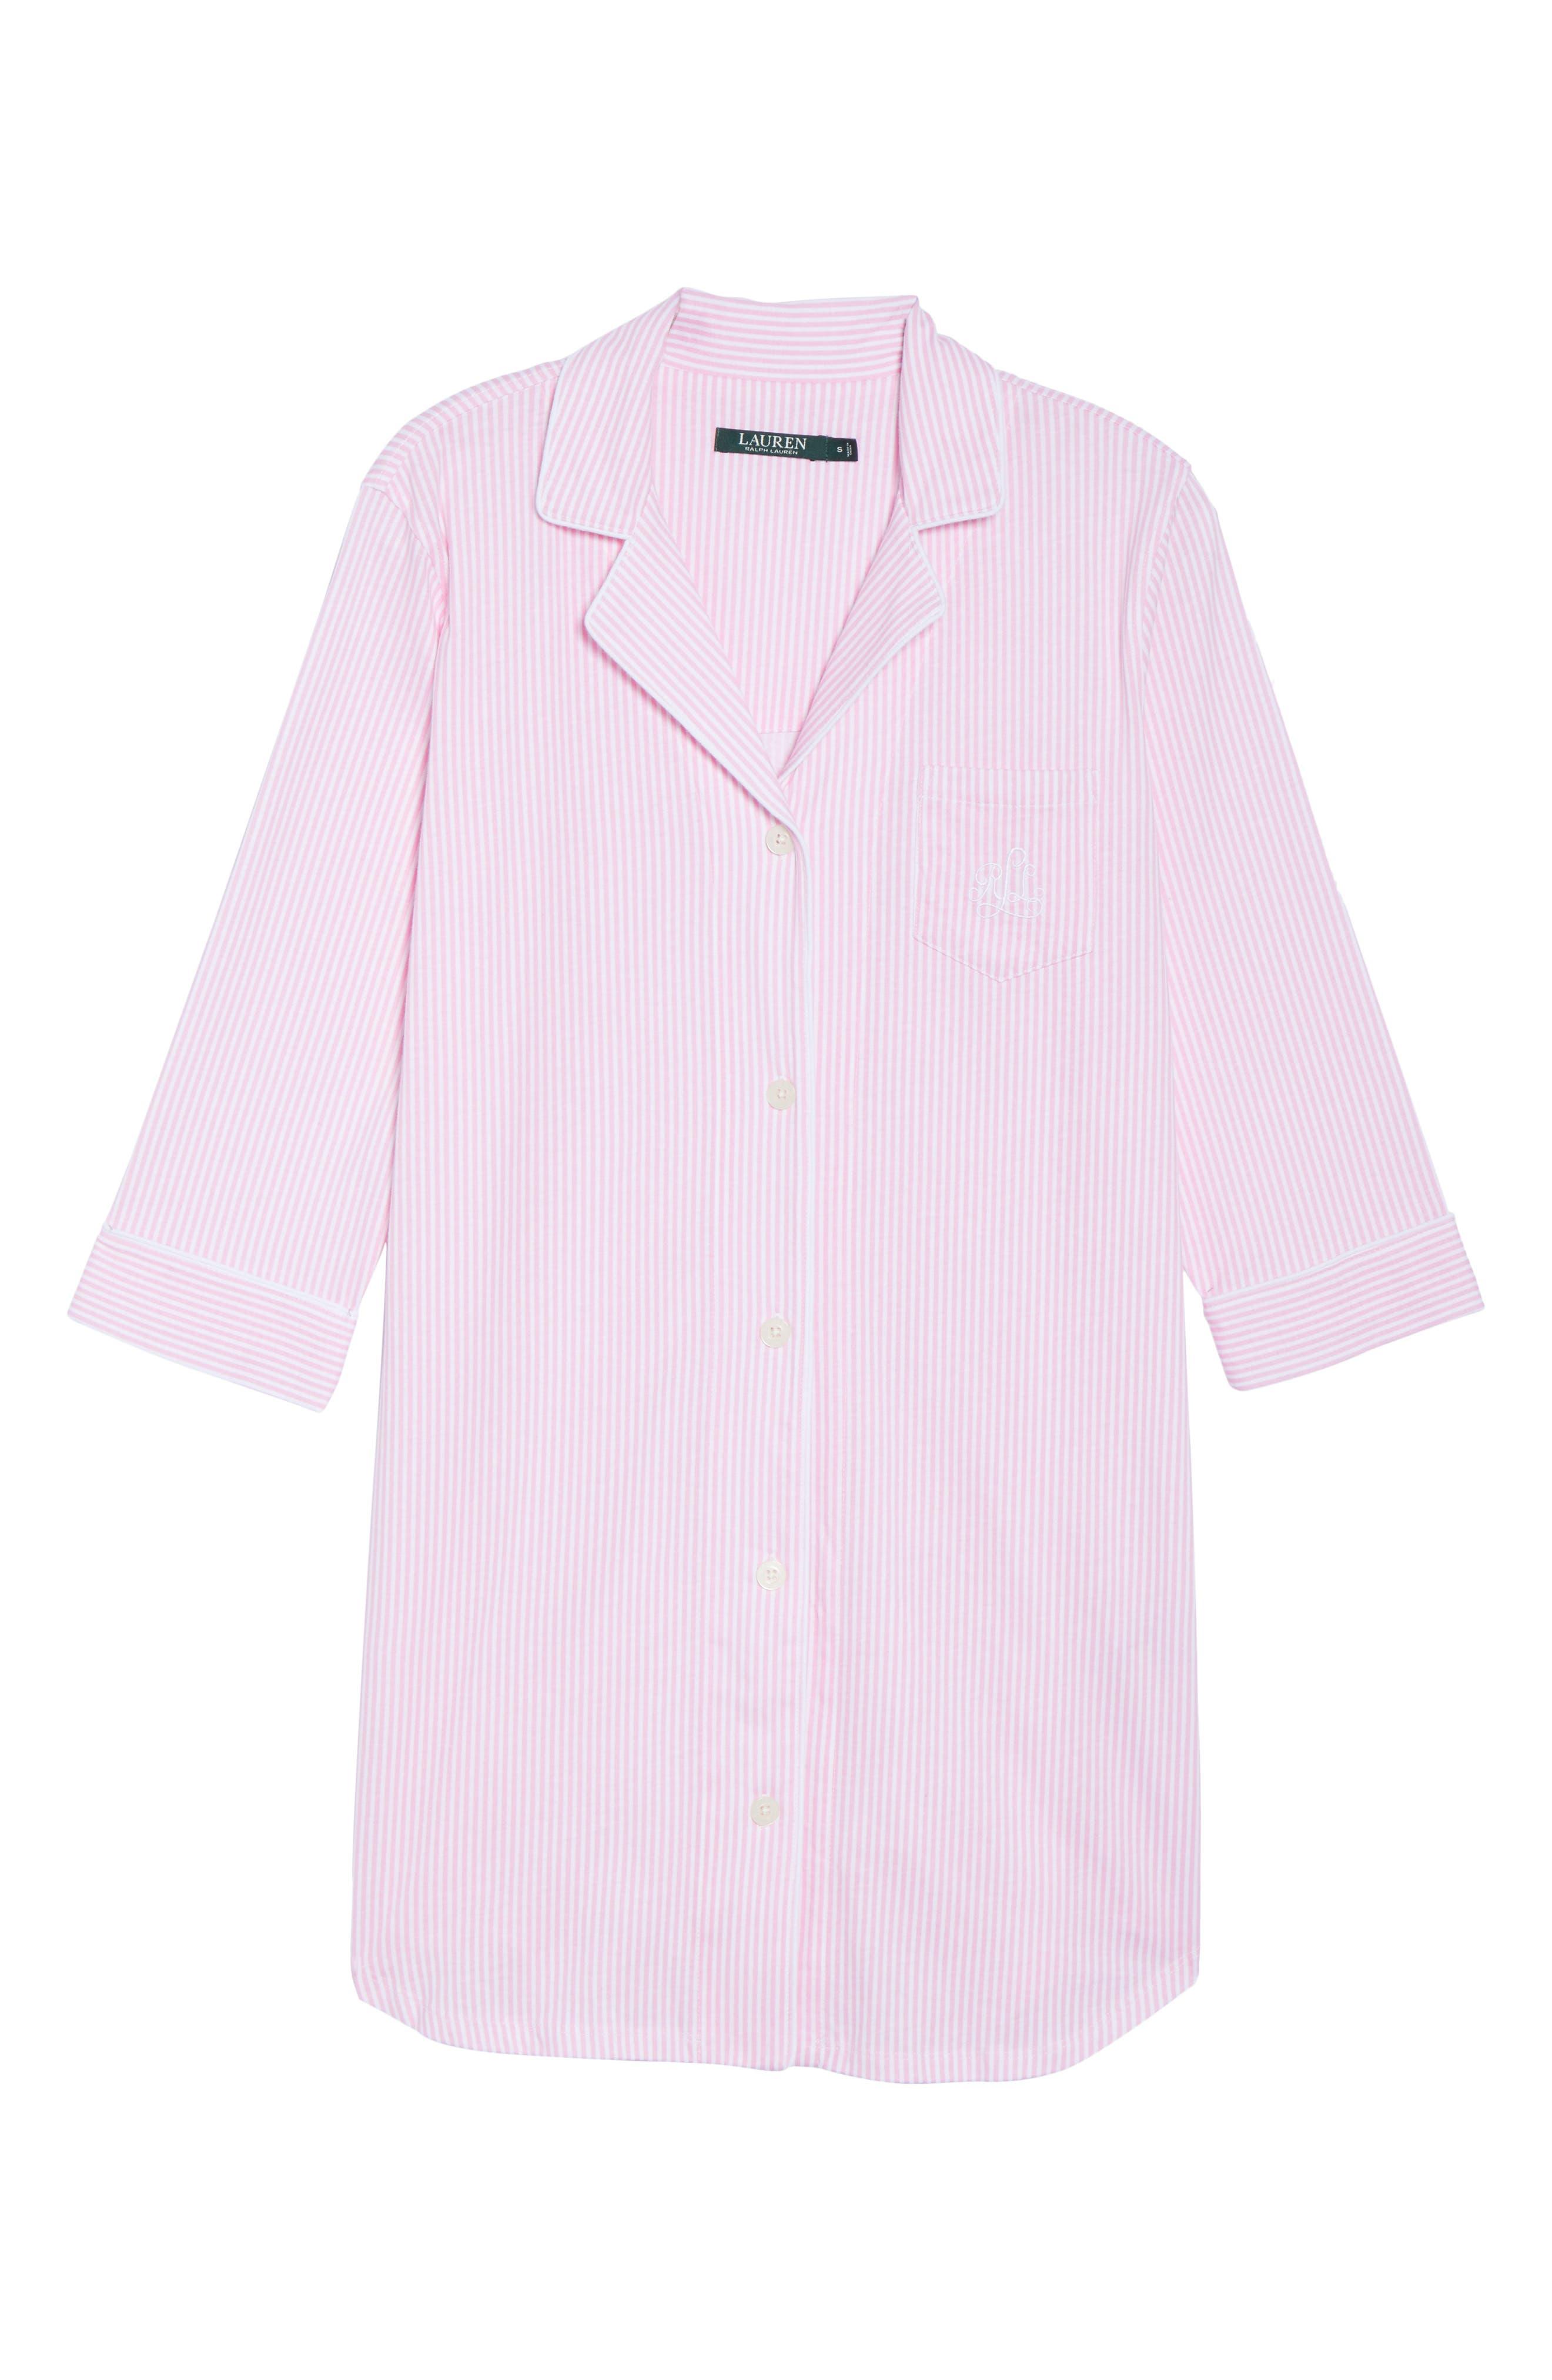 Jersey Sleep Shirt,                             Alternate thumbnail 43, color,